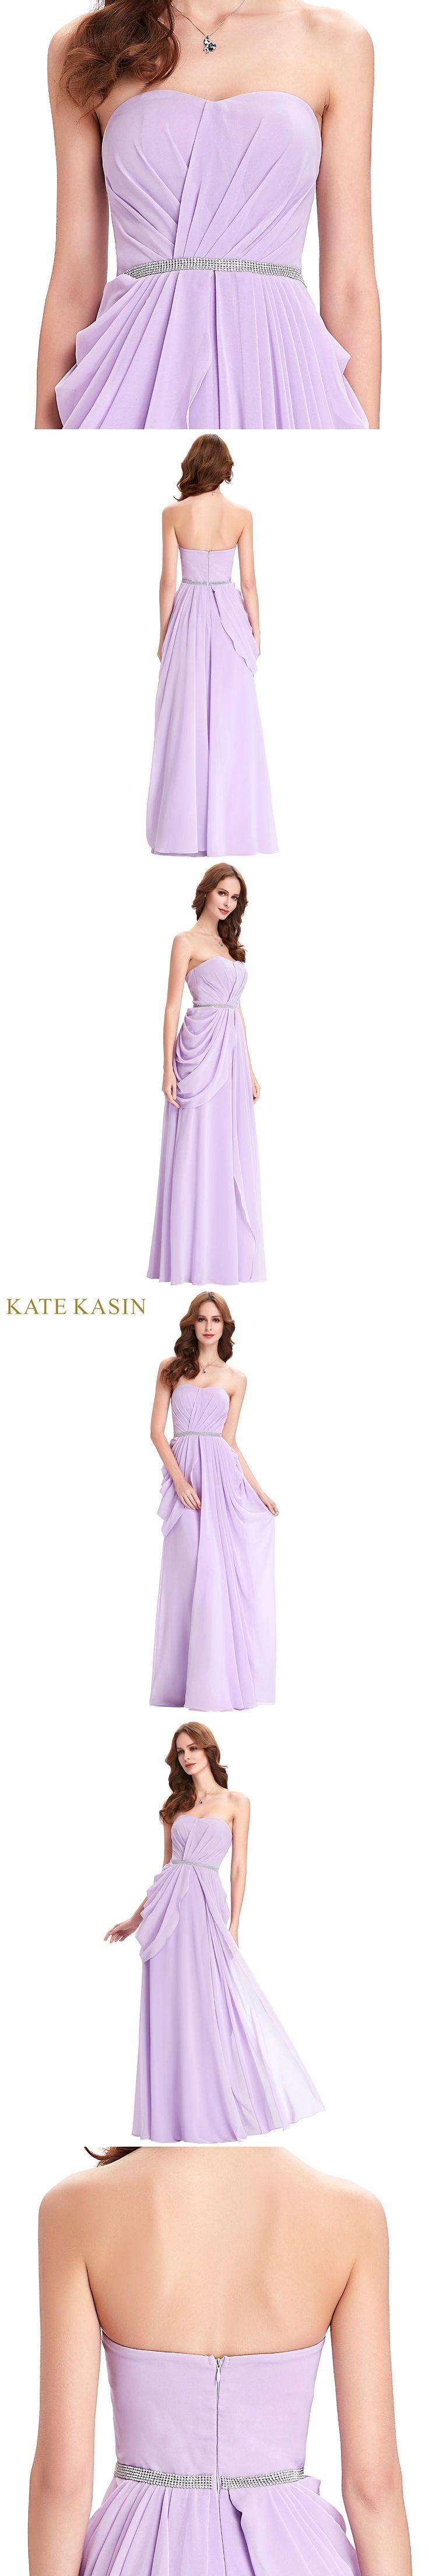 Kate Kasin Long Purple Evening Dresses Strapless Ruched Dress Vestido de Noiva Wedding Long Dresses for Evening Party Gown 0077